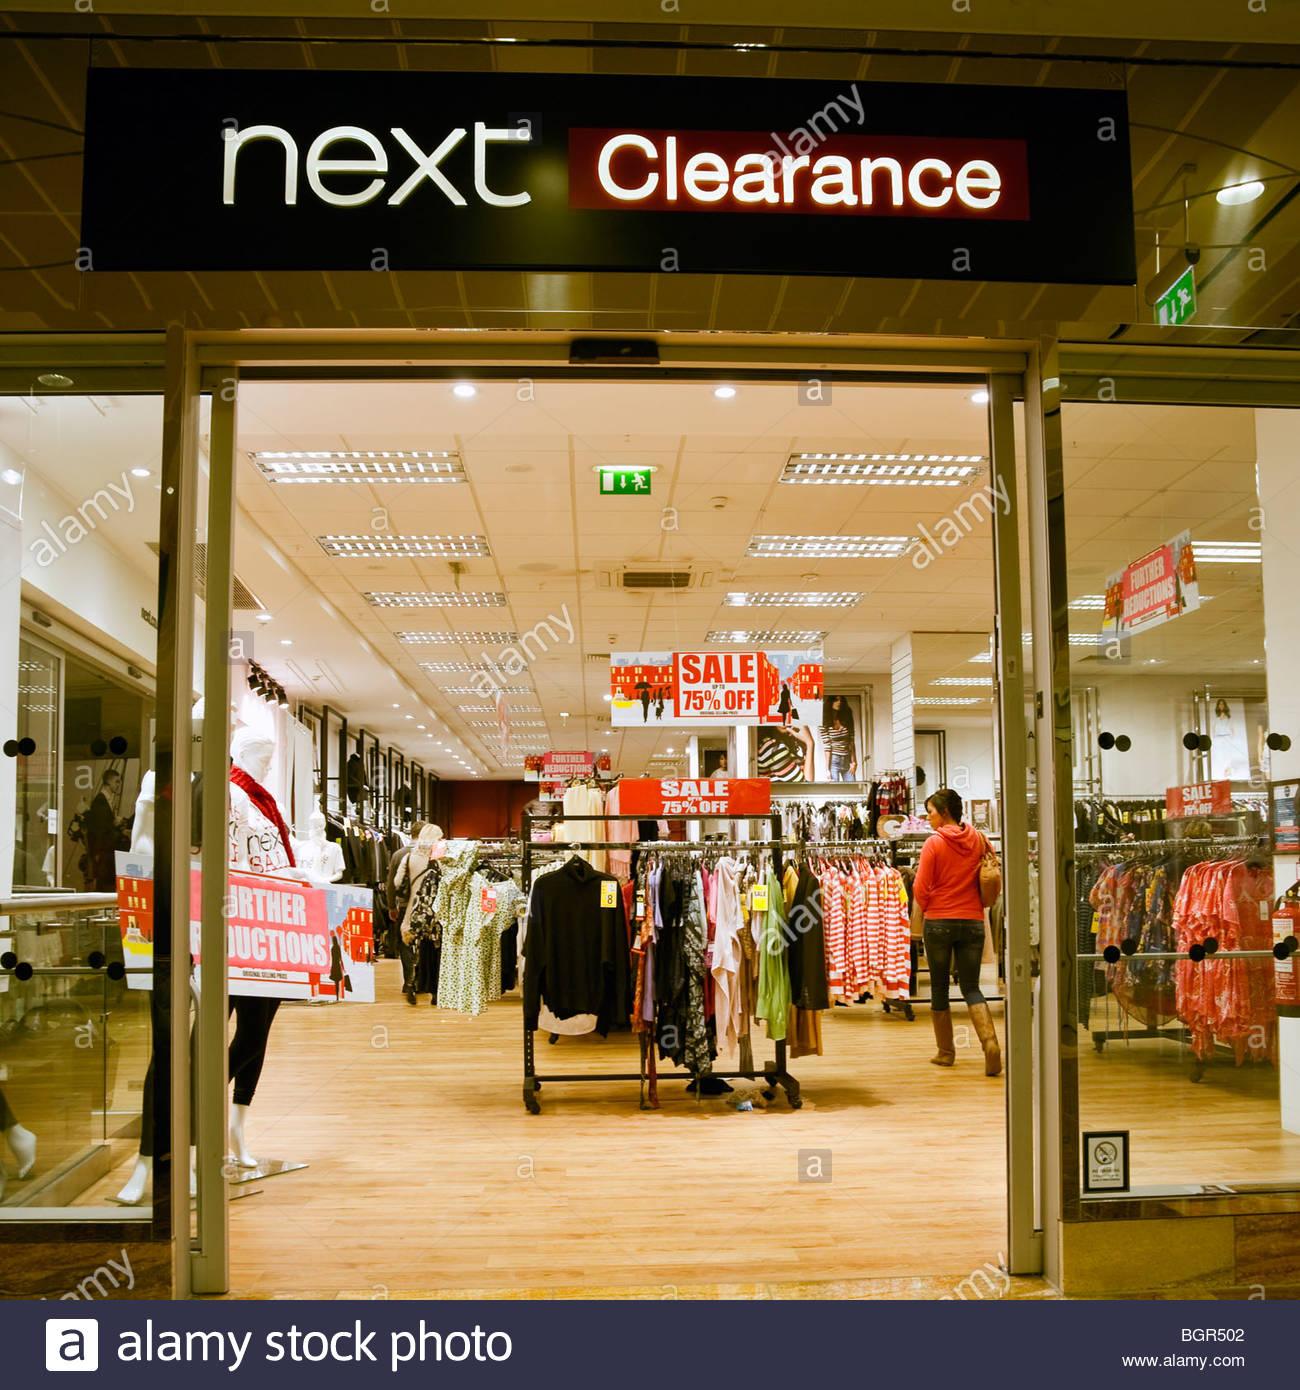 Designer Discount Clothing Shop | Next Clearance Clothing Shop At Gloucester Quays Designer Outlet Uk